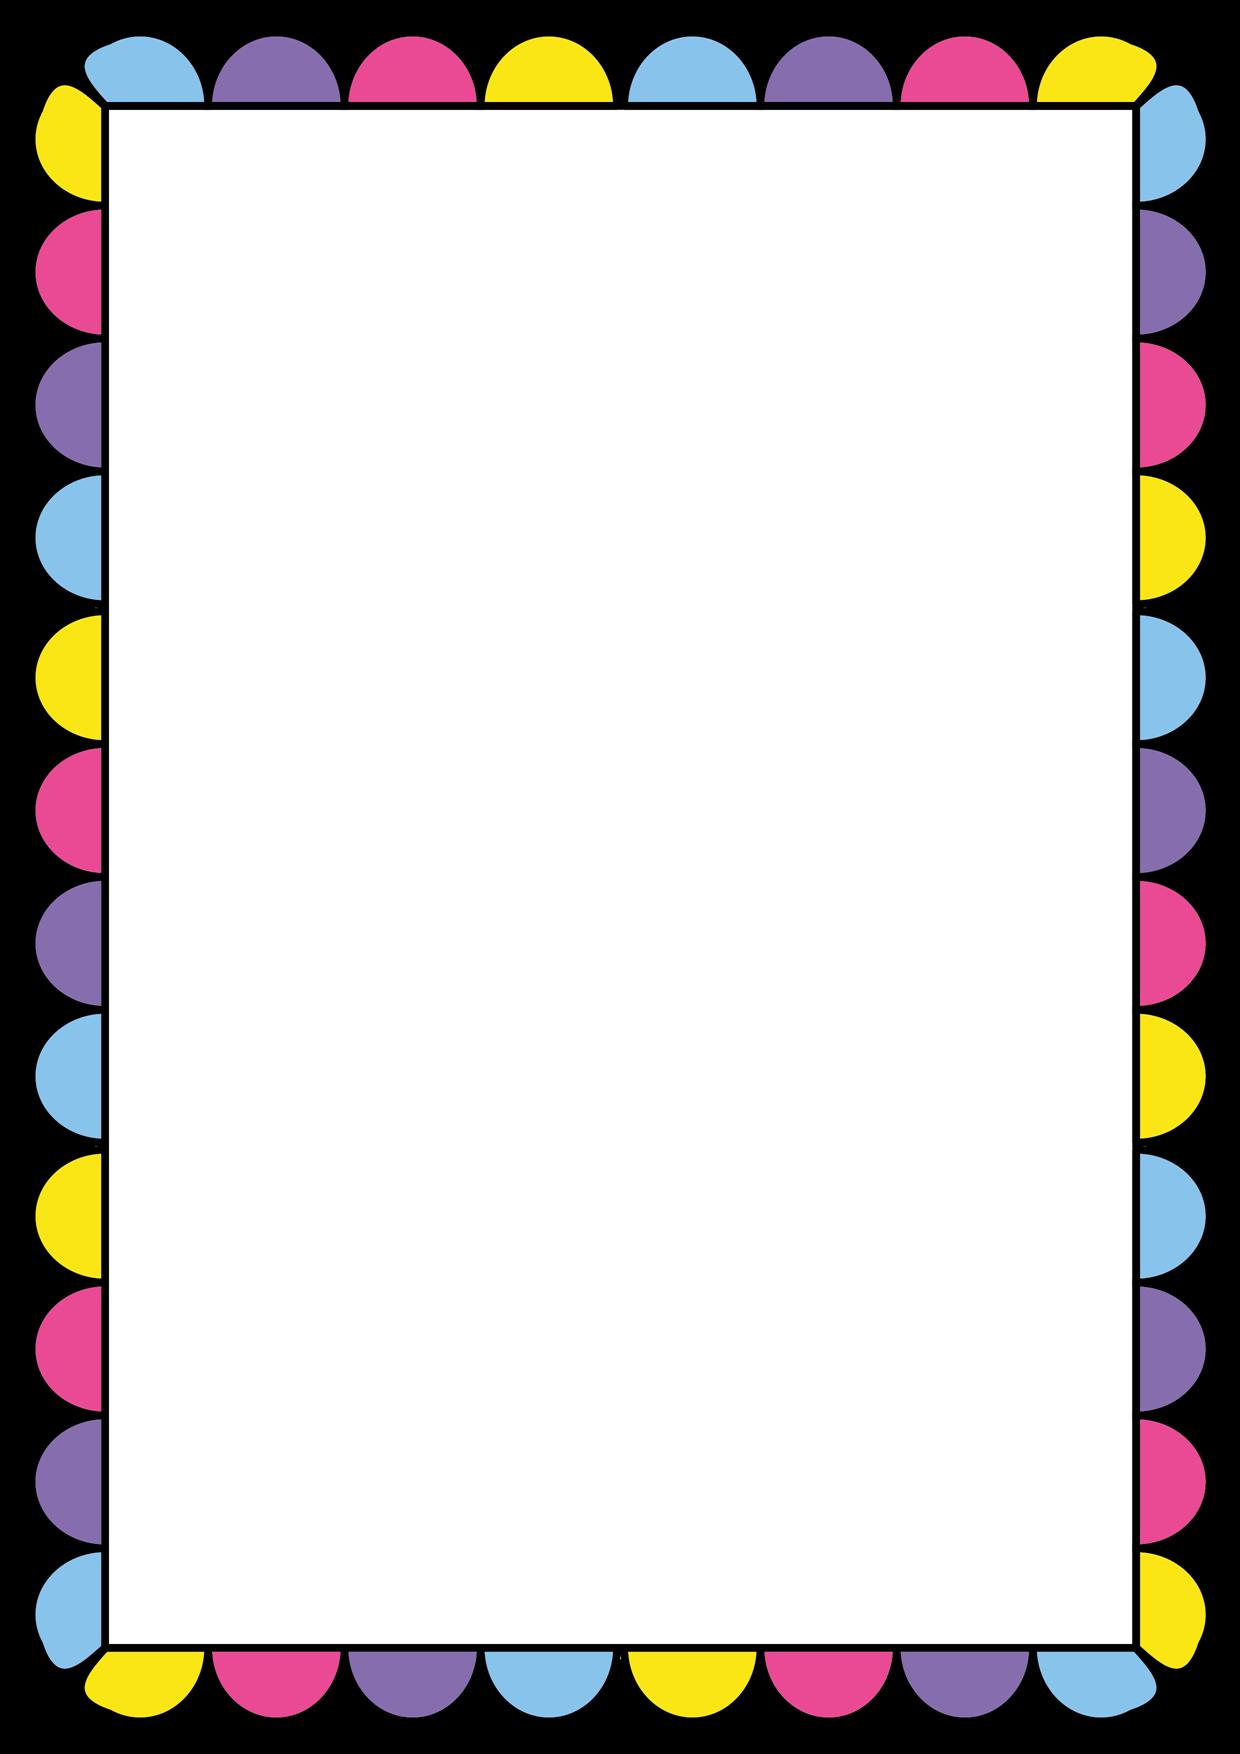 Frame clipart education. Paper idea game line